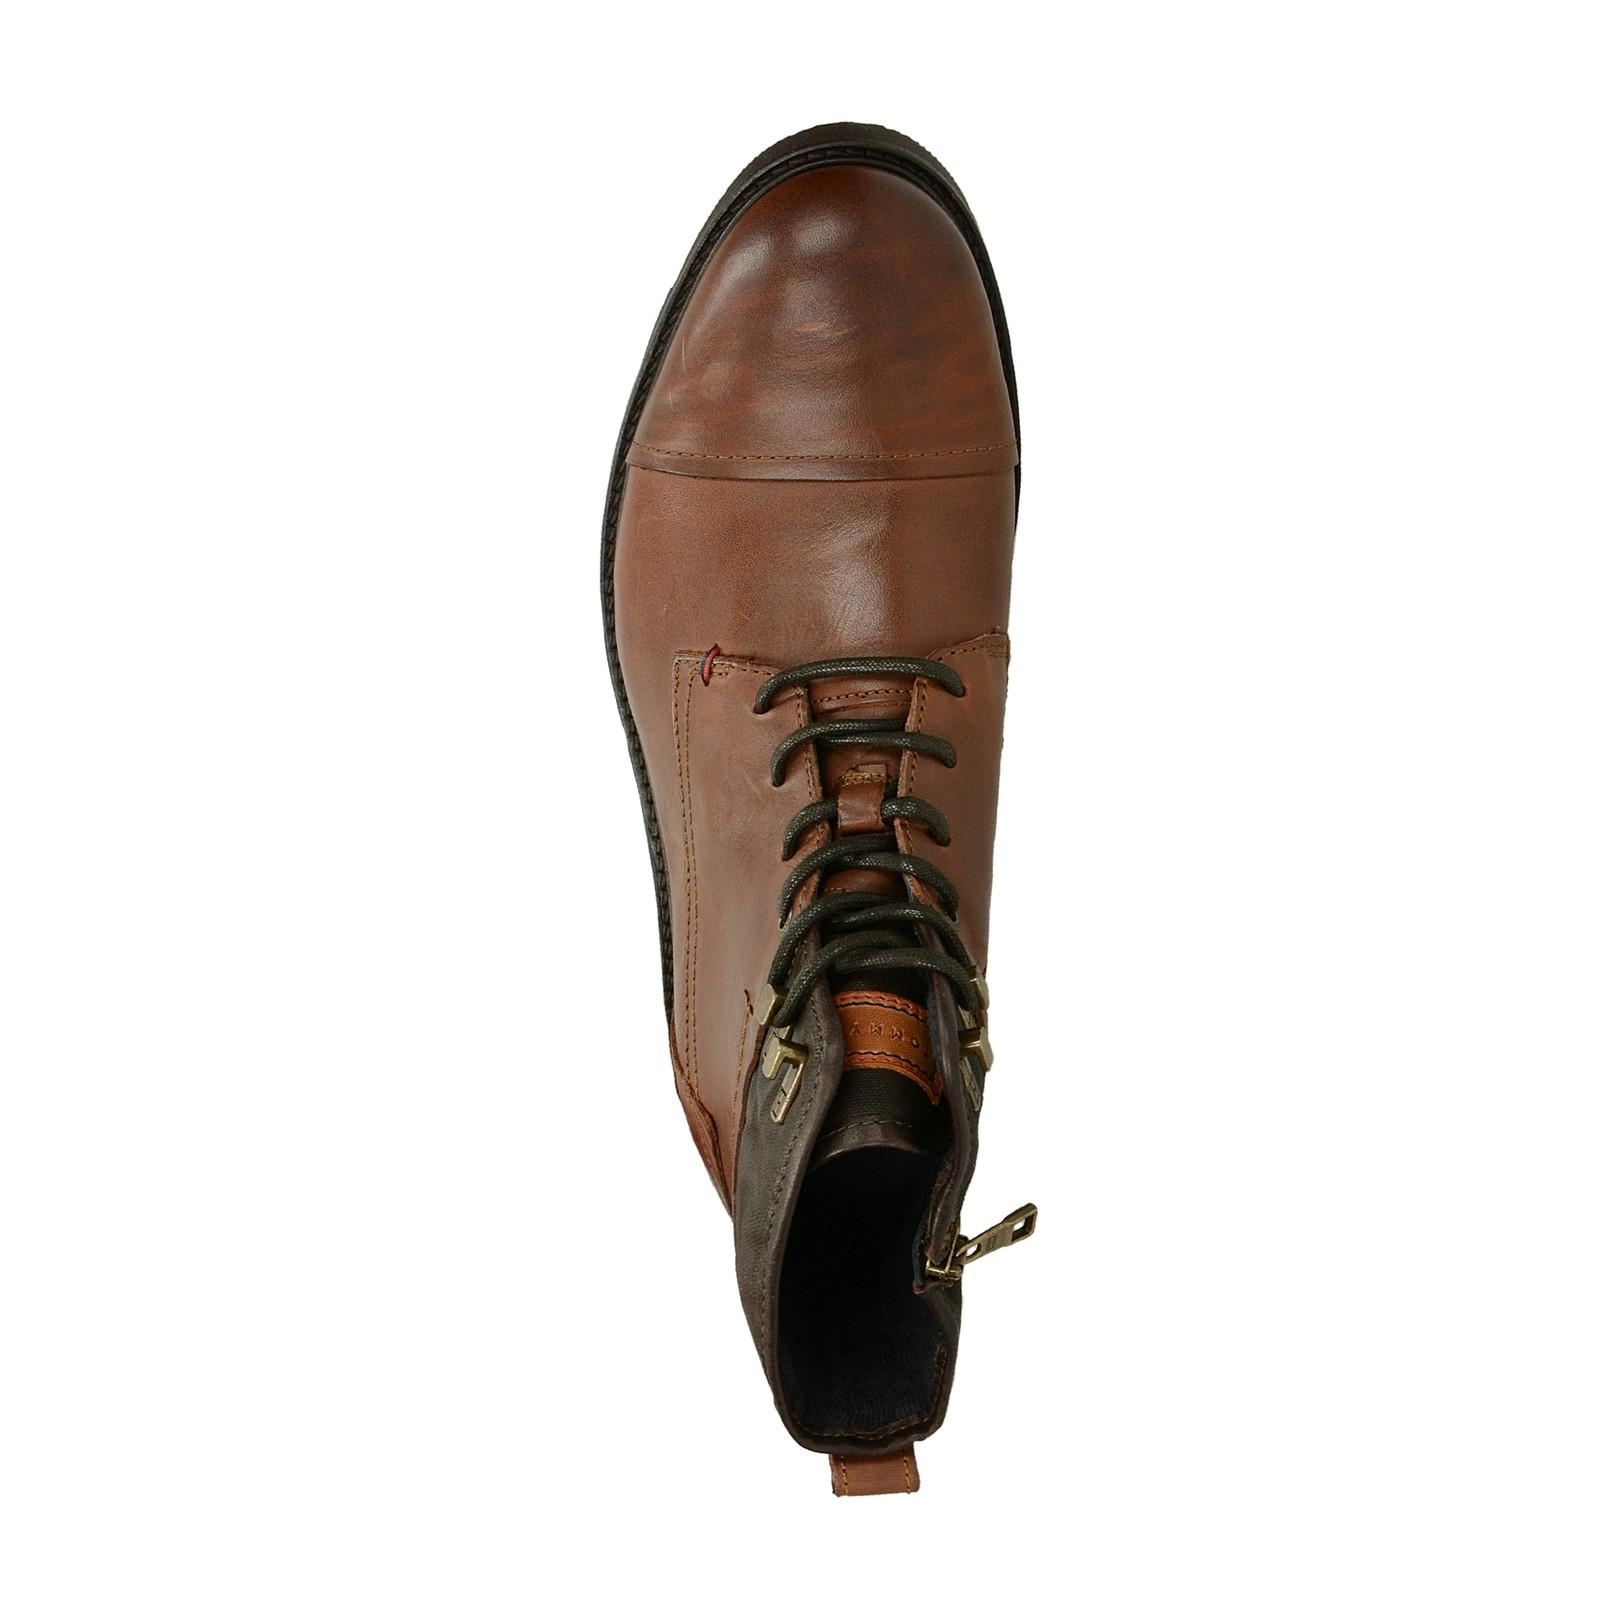 Tommy Hilfiger pánska štýlová členková obuv - koňaková ... 7a31368c1b8